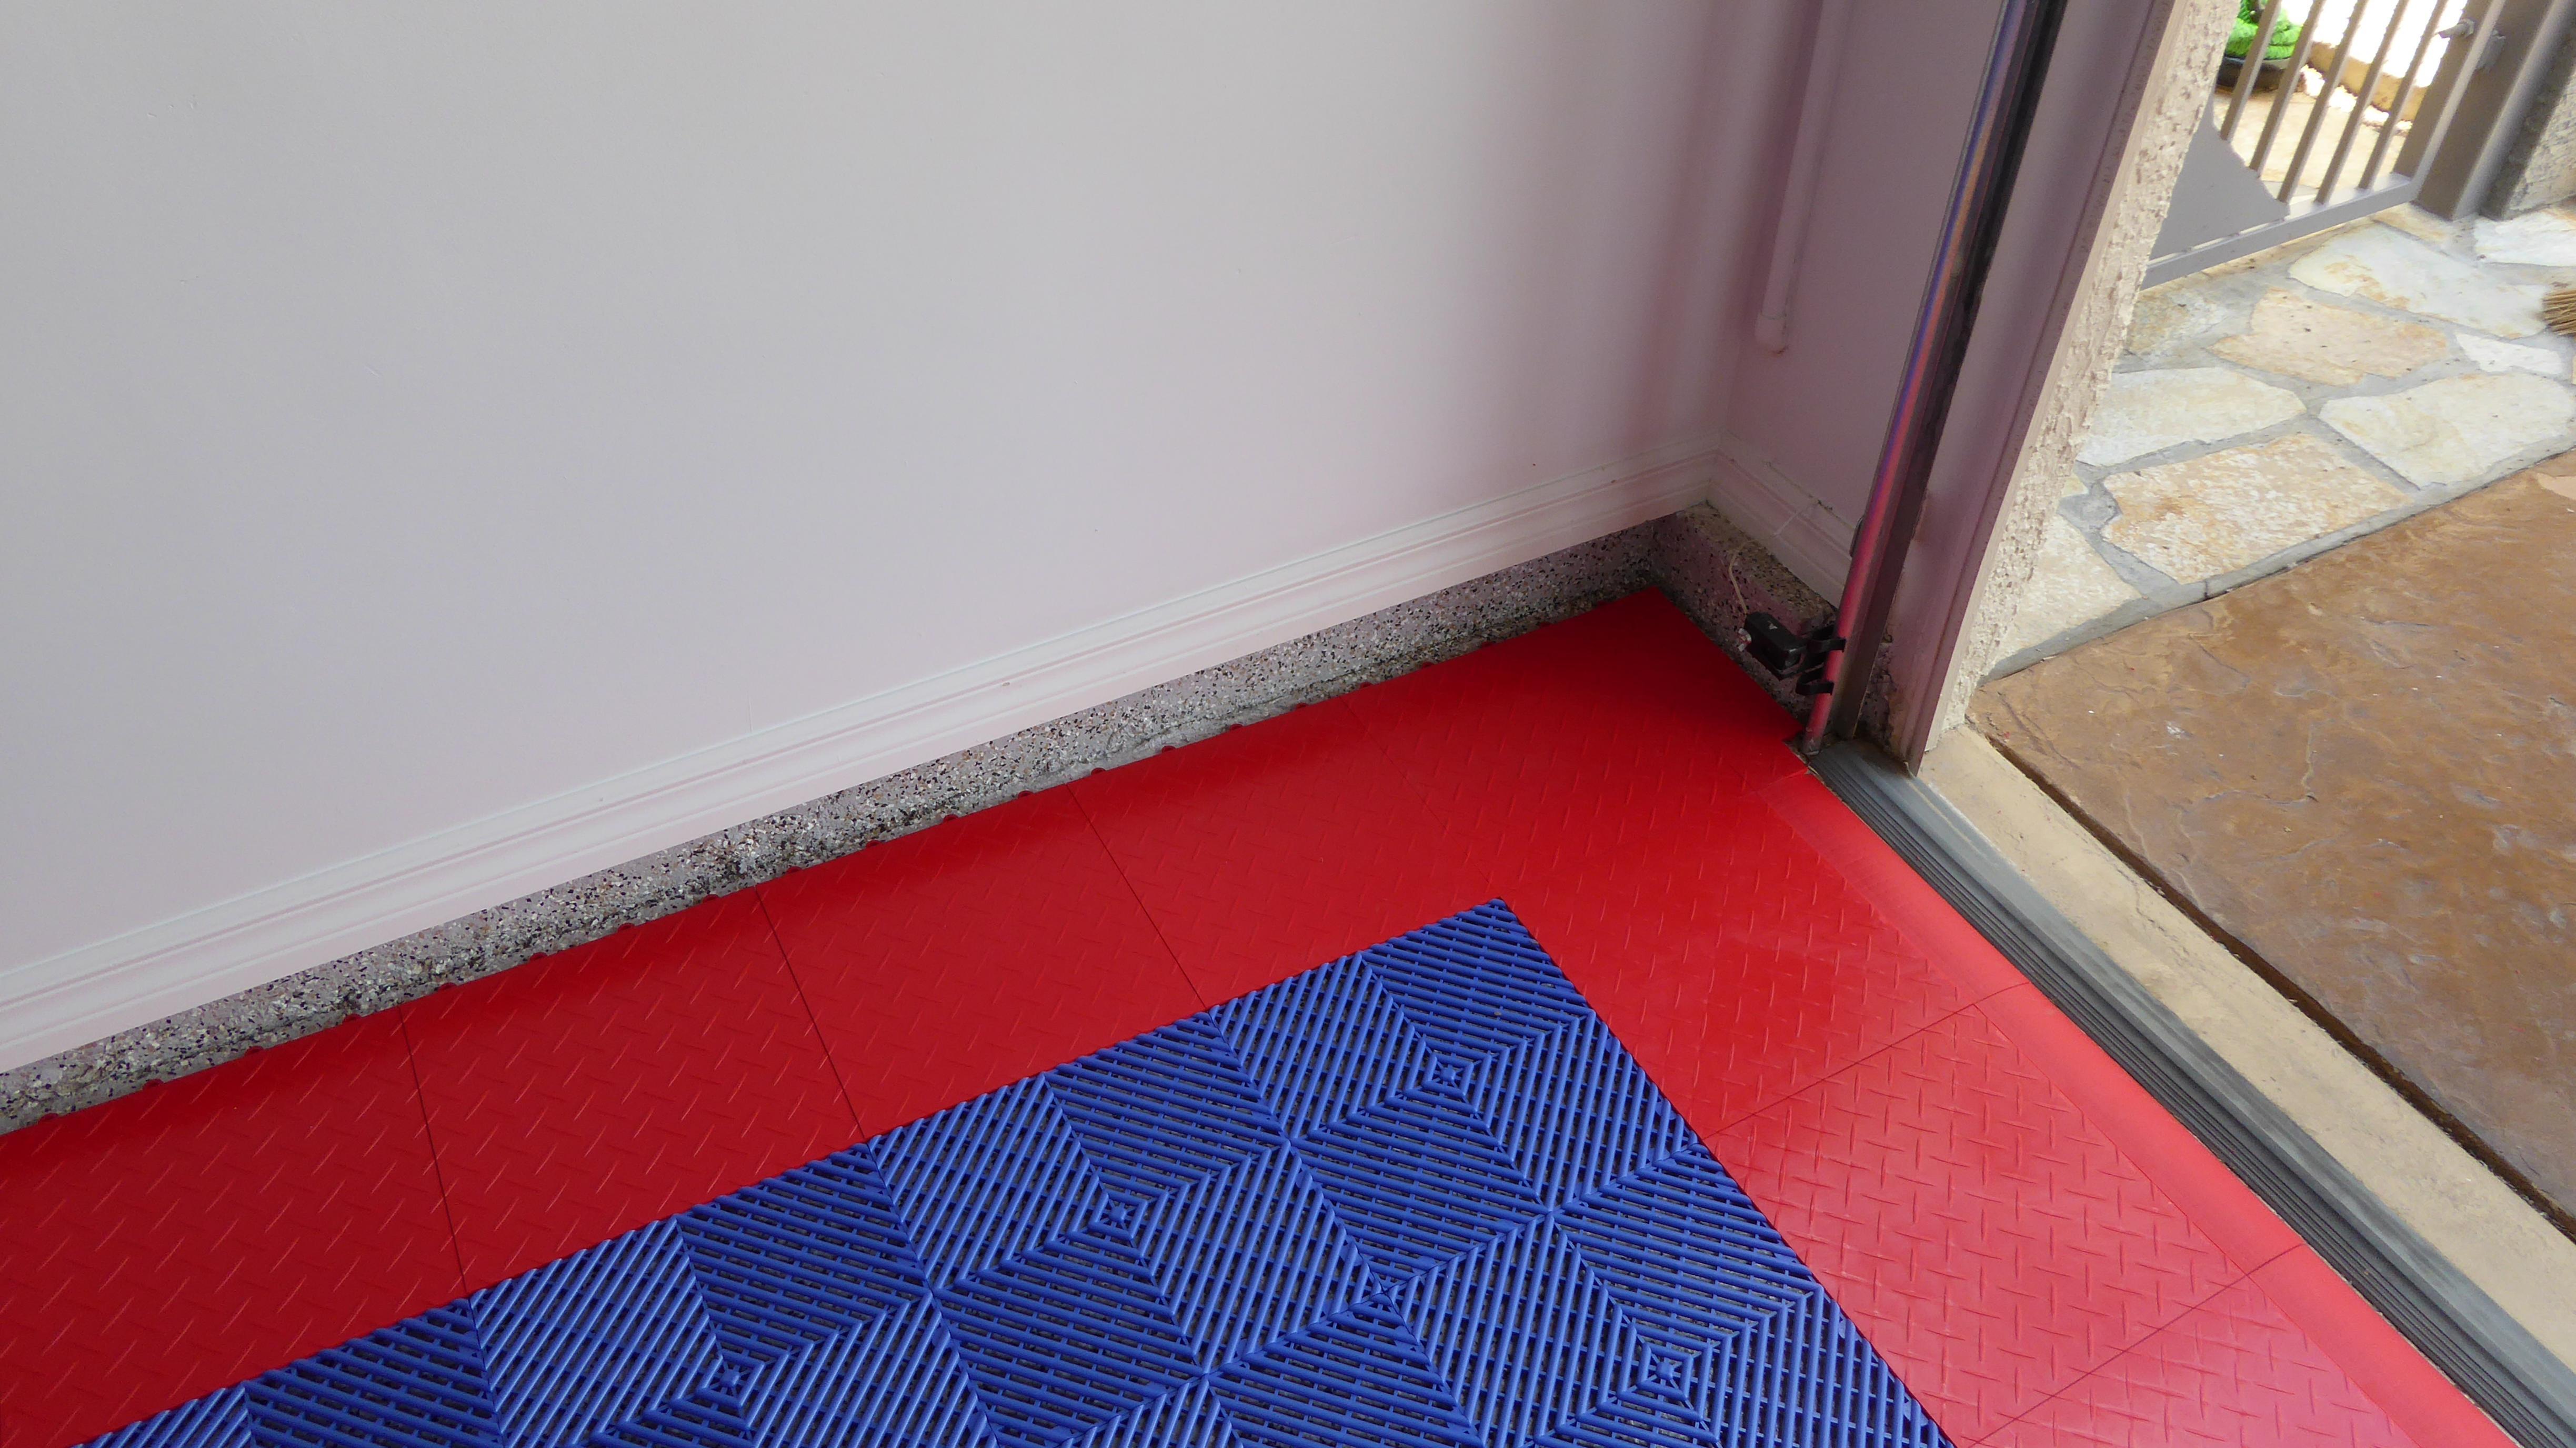 Installing Racedeck Garage Flooring